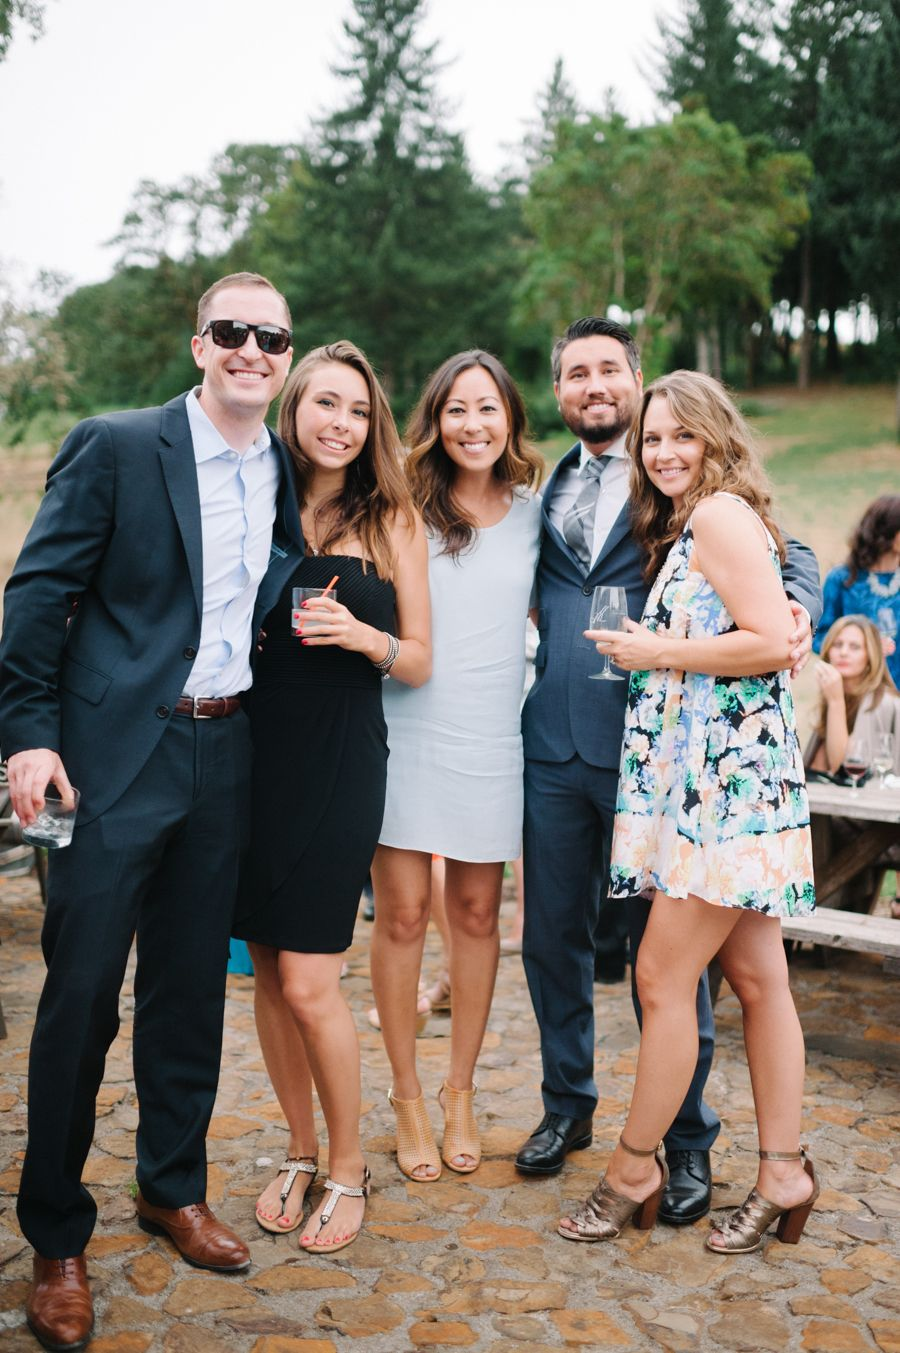 Elegant Oregon Vineyard Summer Wedding Dresscode